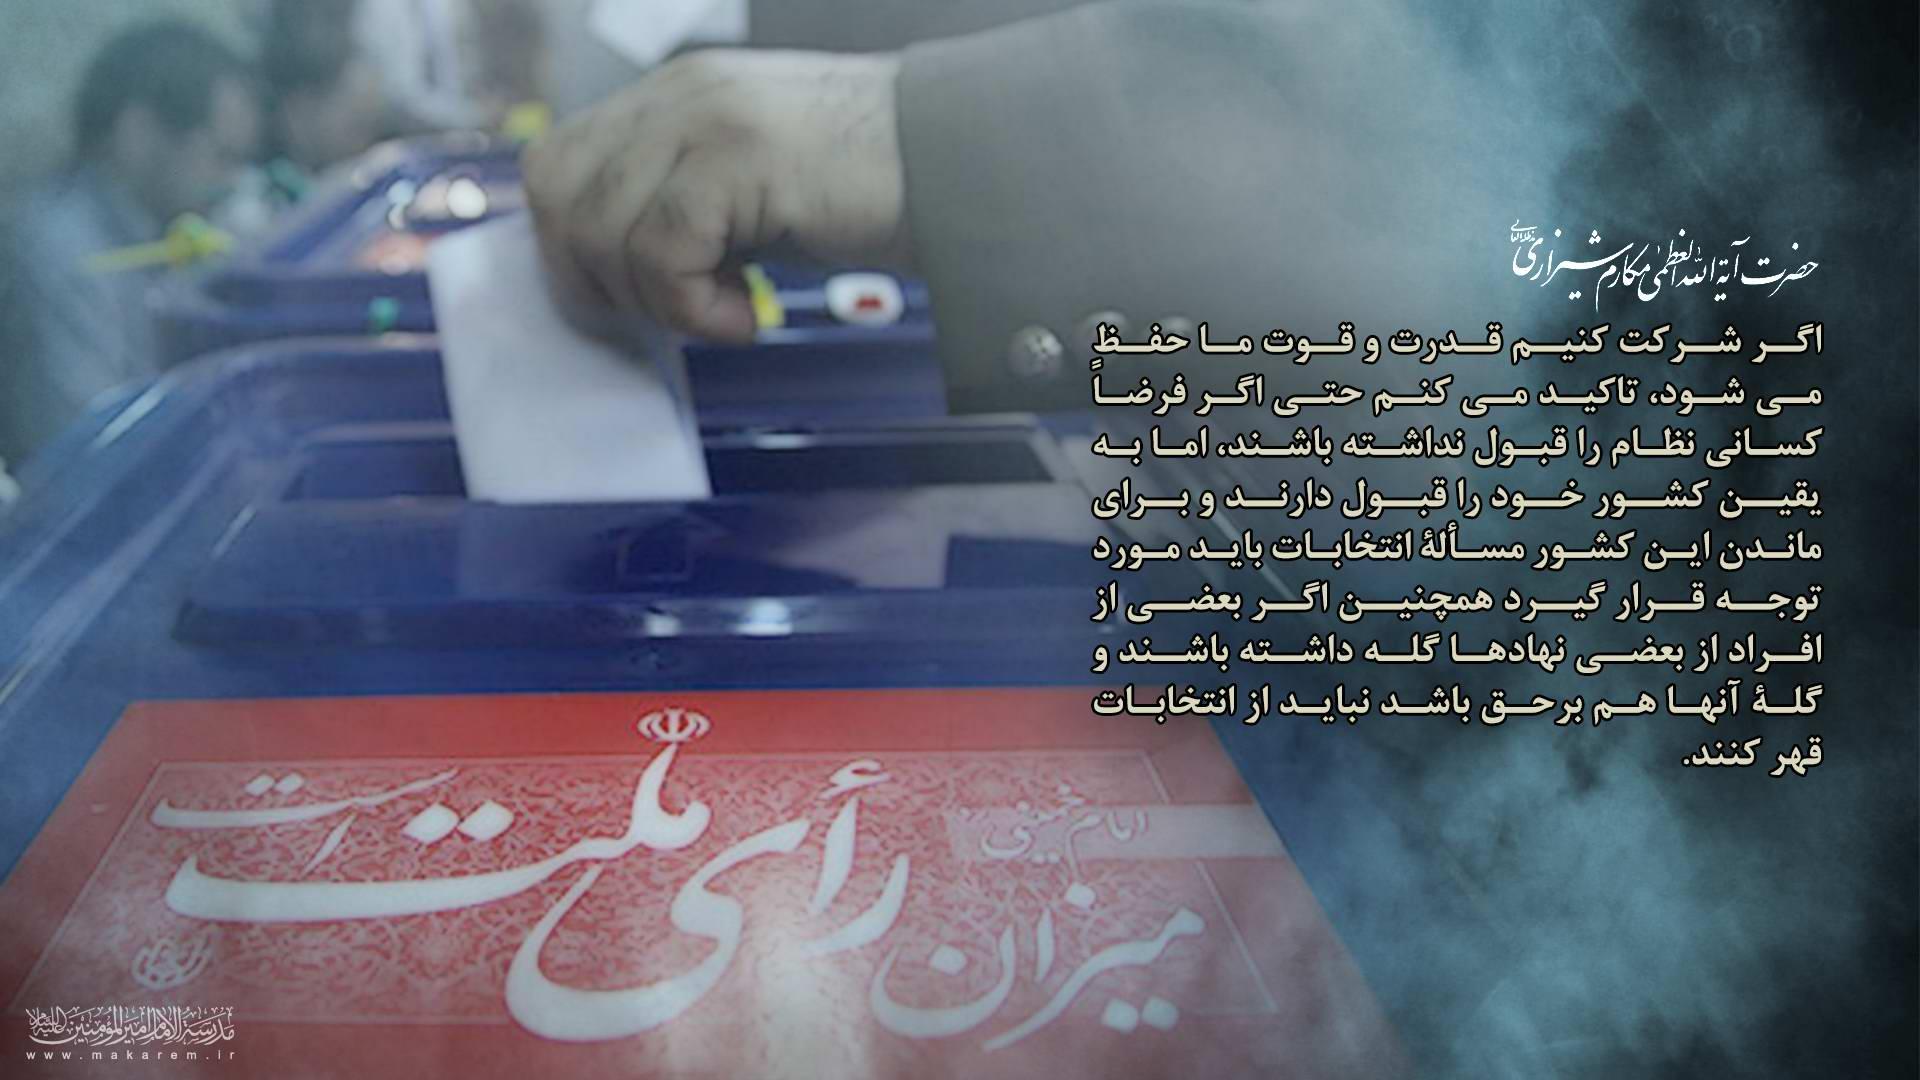 انتخابات 04-مدرسه الامام امیر المومنین (ع)